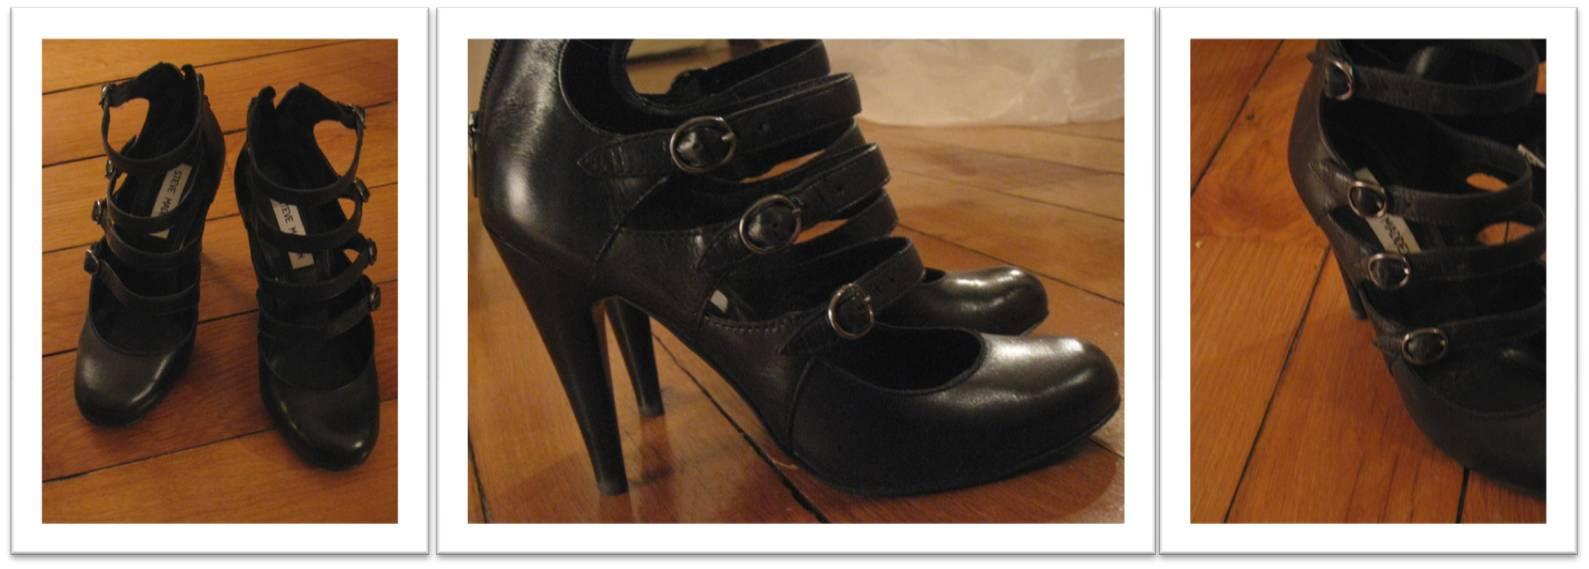 Lacher La – Stilettos I Bride Love OPZTwkiXu